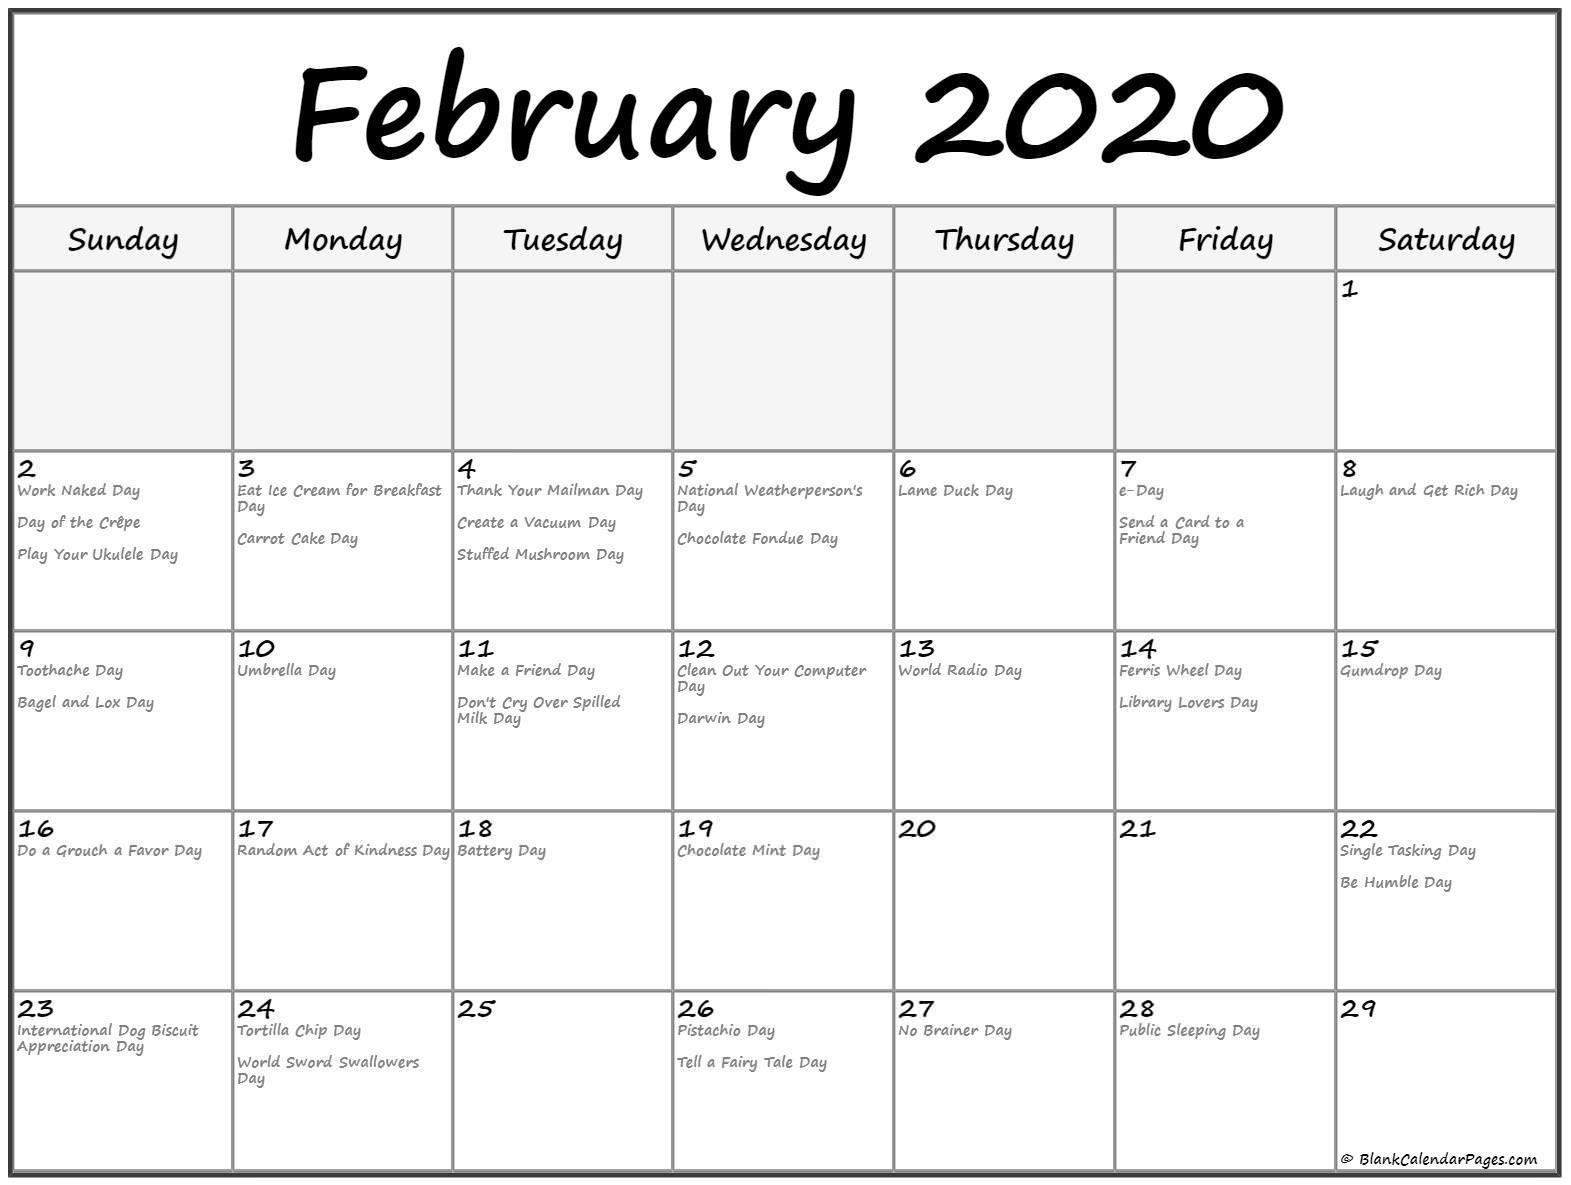 February 2020 Calendar with Holidays Printable Collection Of February 2020 Calendars with Holidays